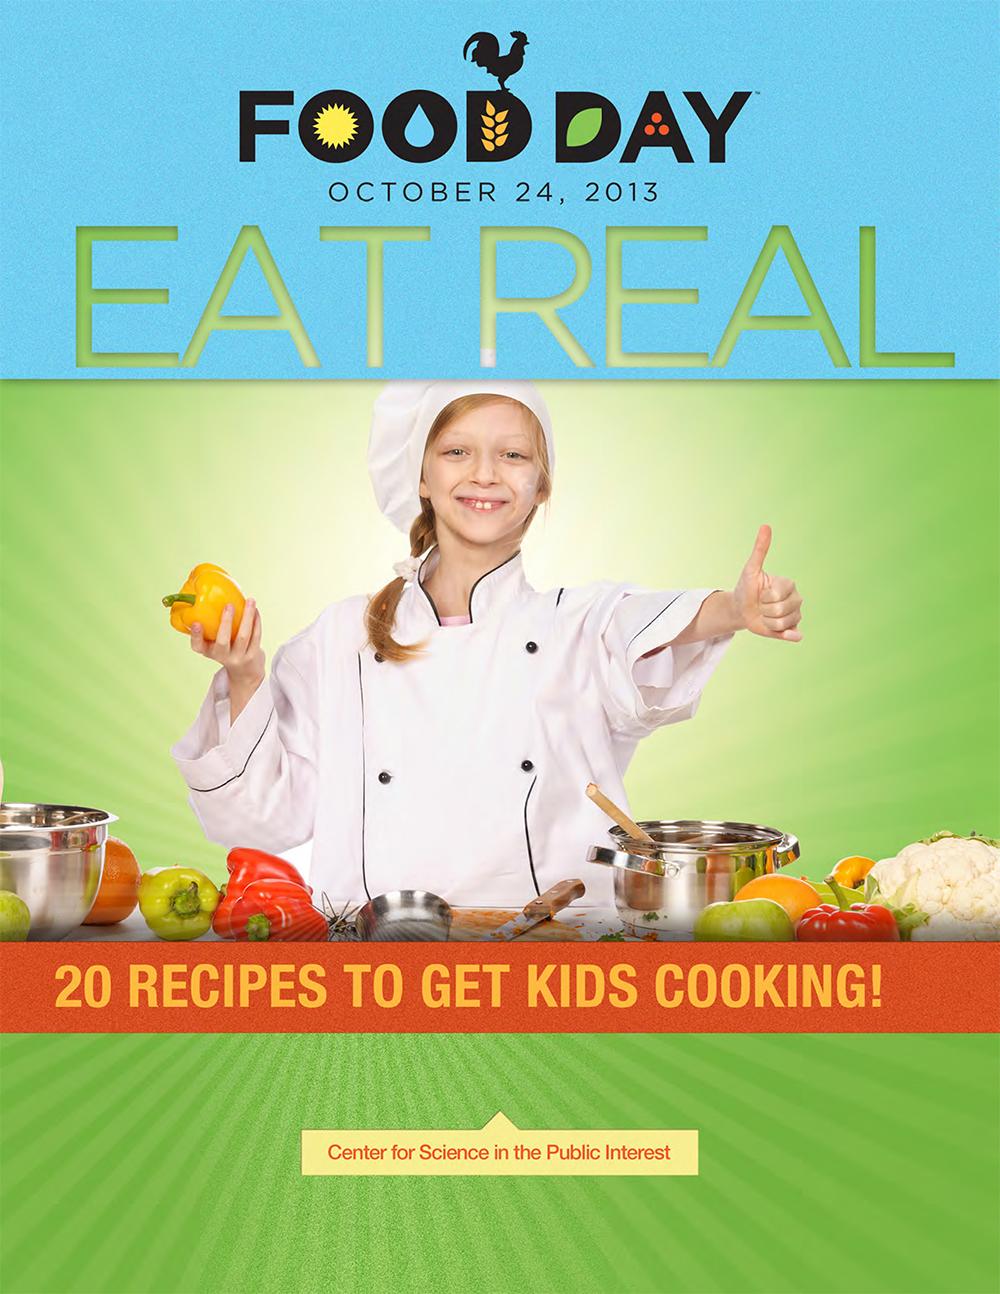 20-Recipes-Food-Day-Kids-Cookbook-2013-1